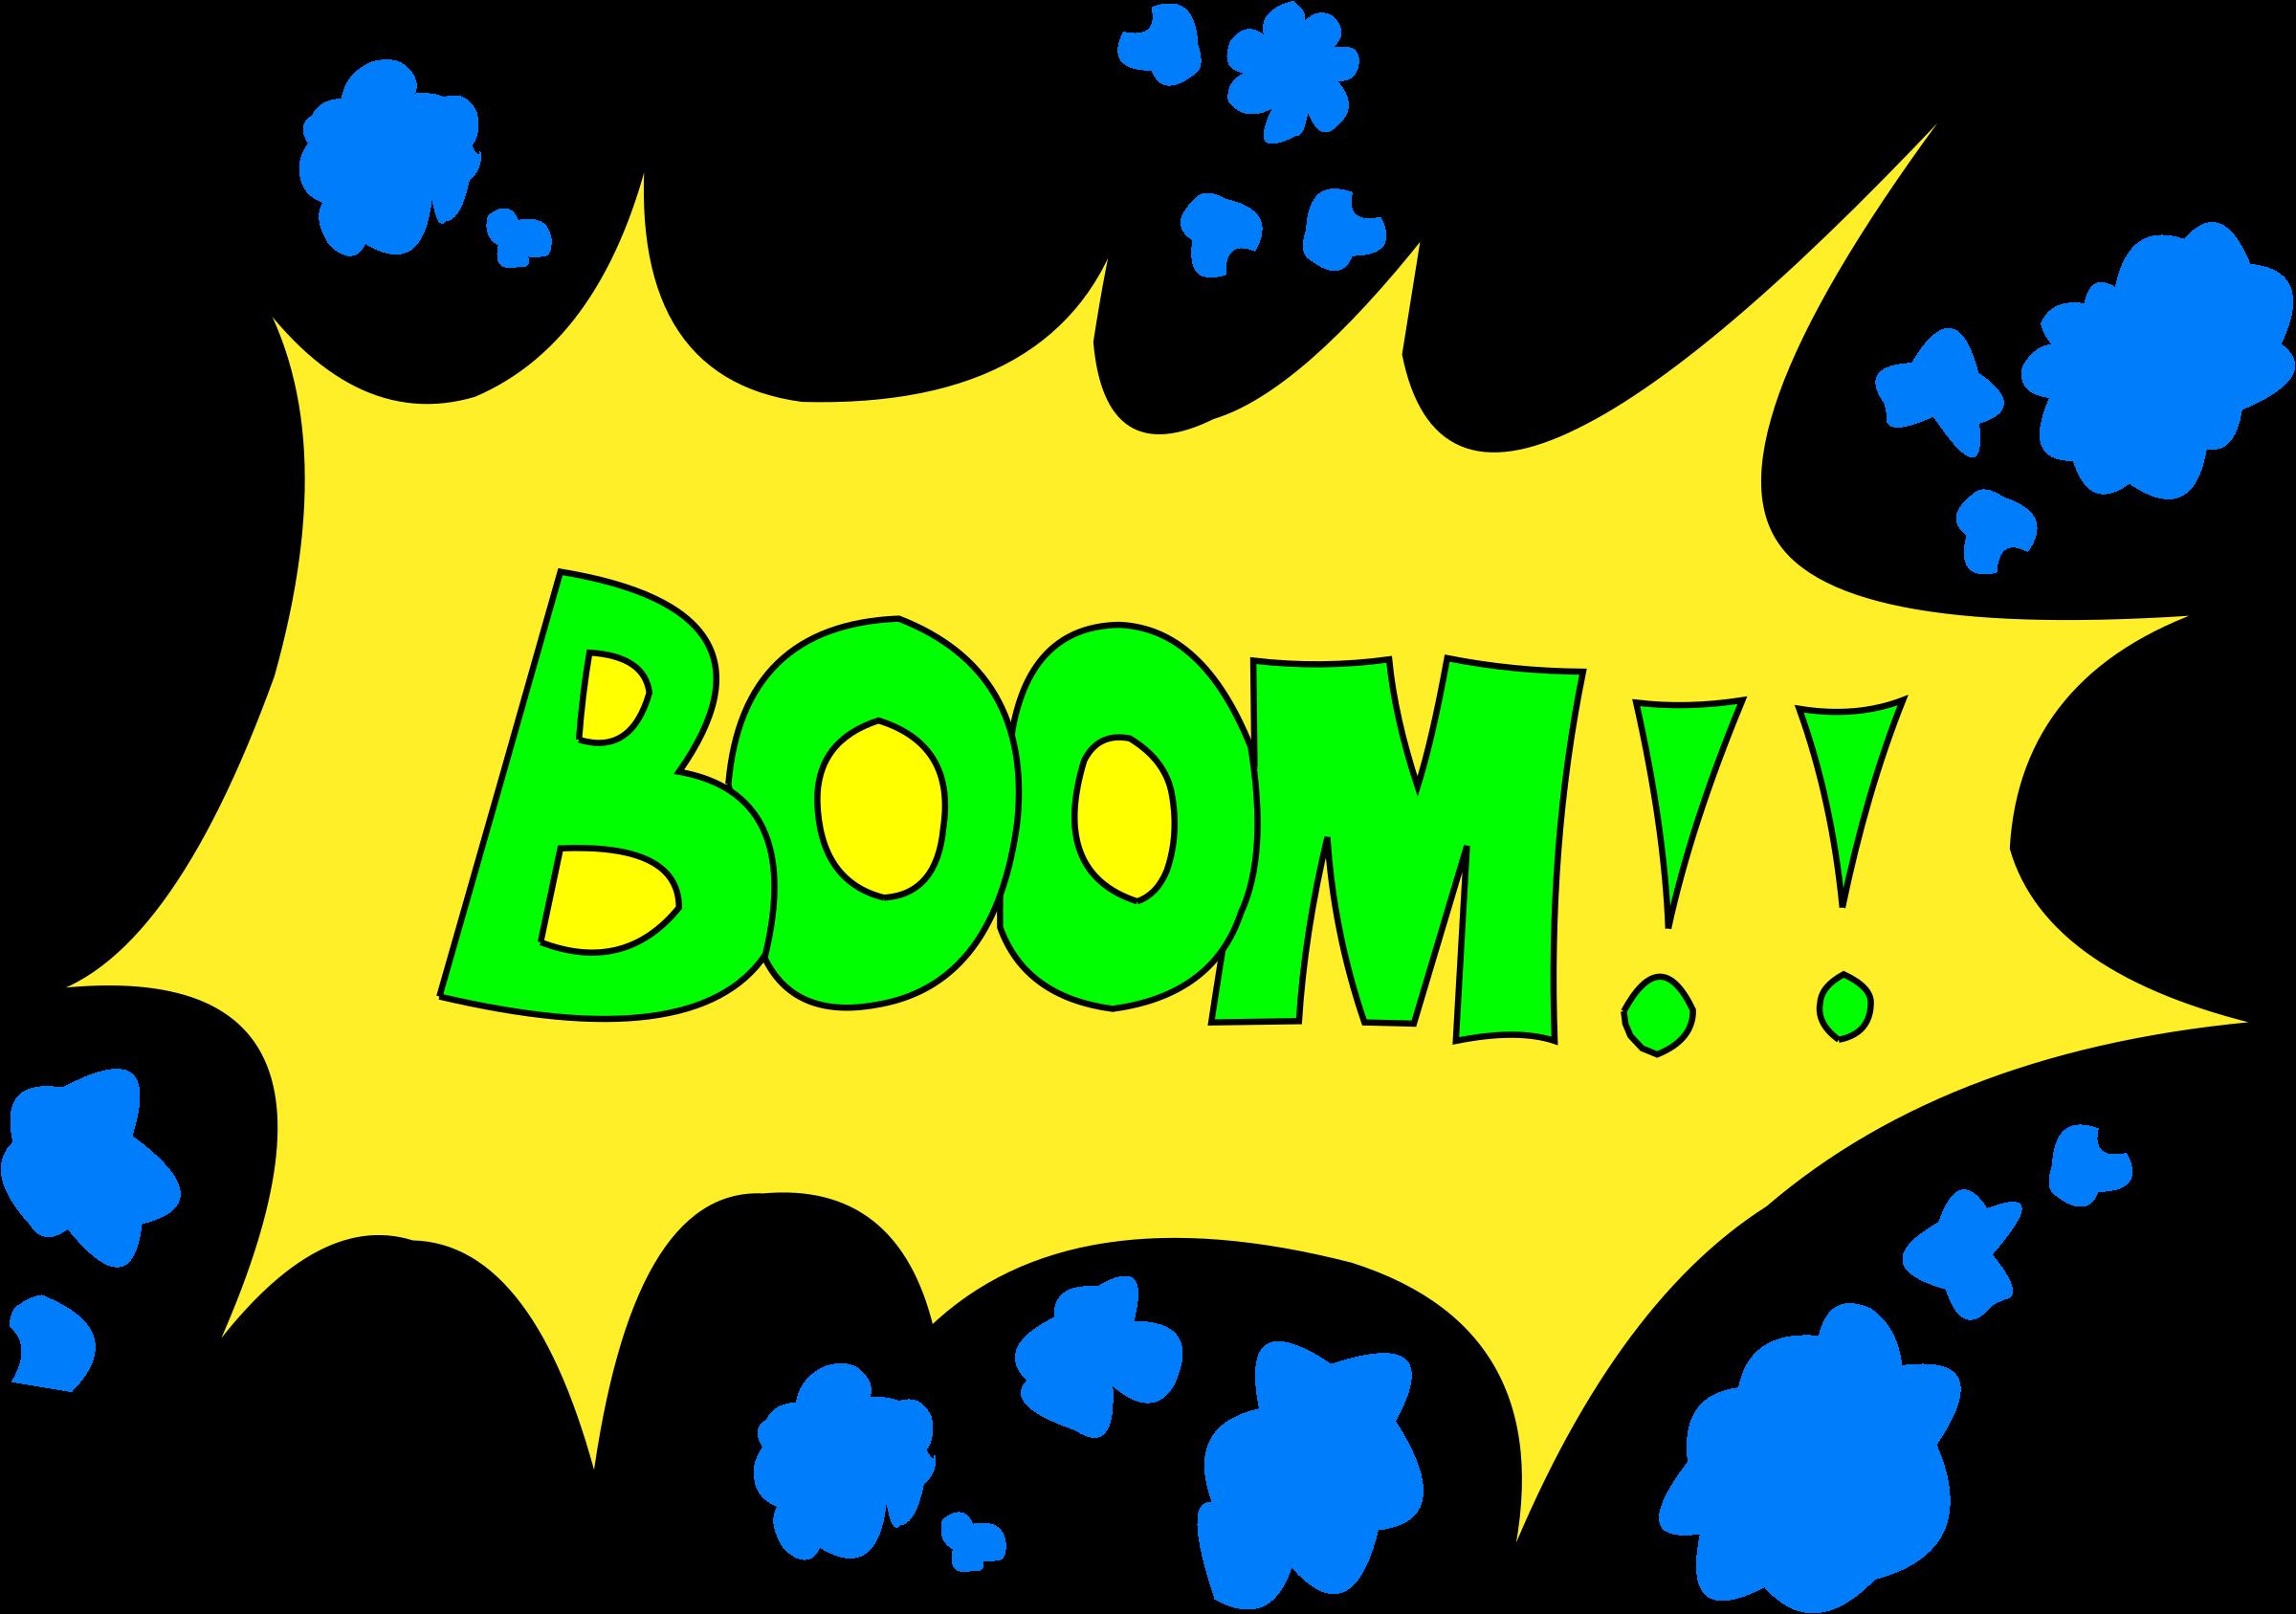 Boom clipart sign. Big image png